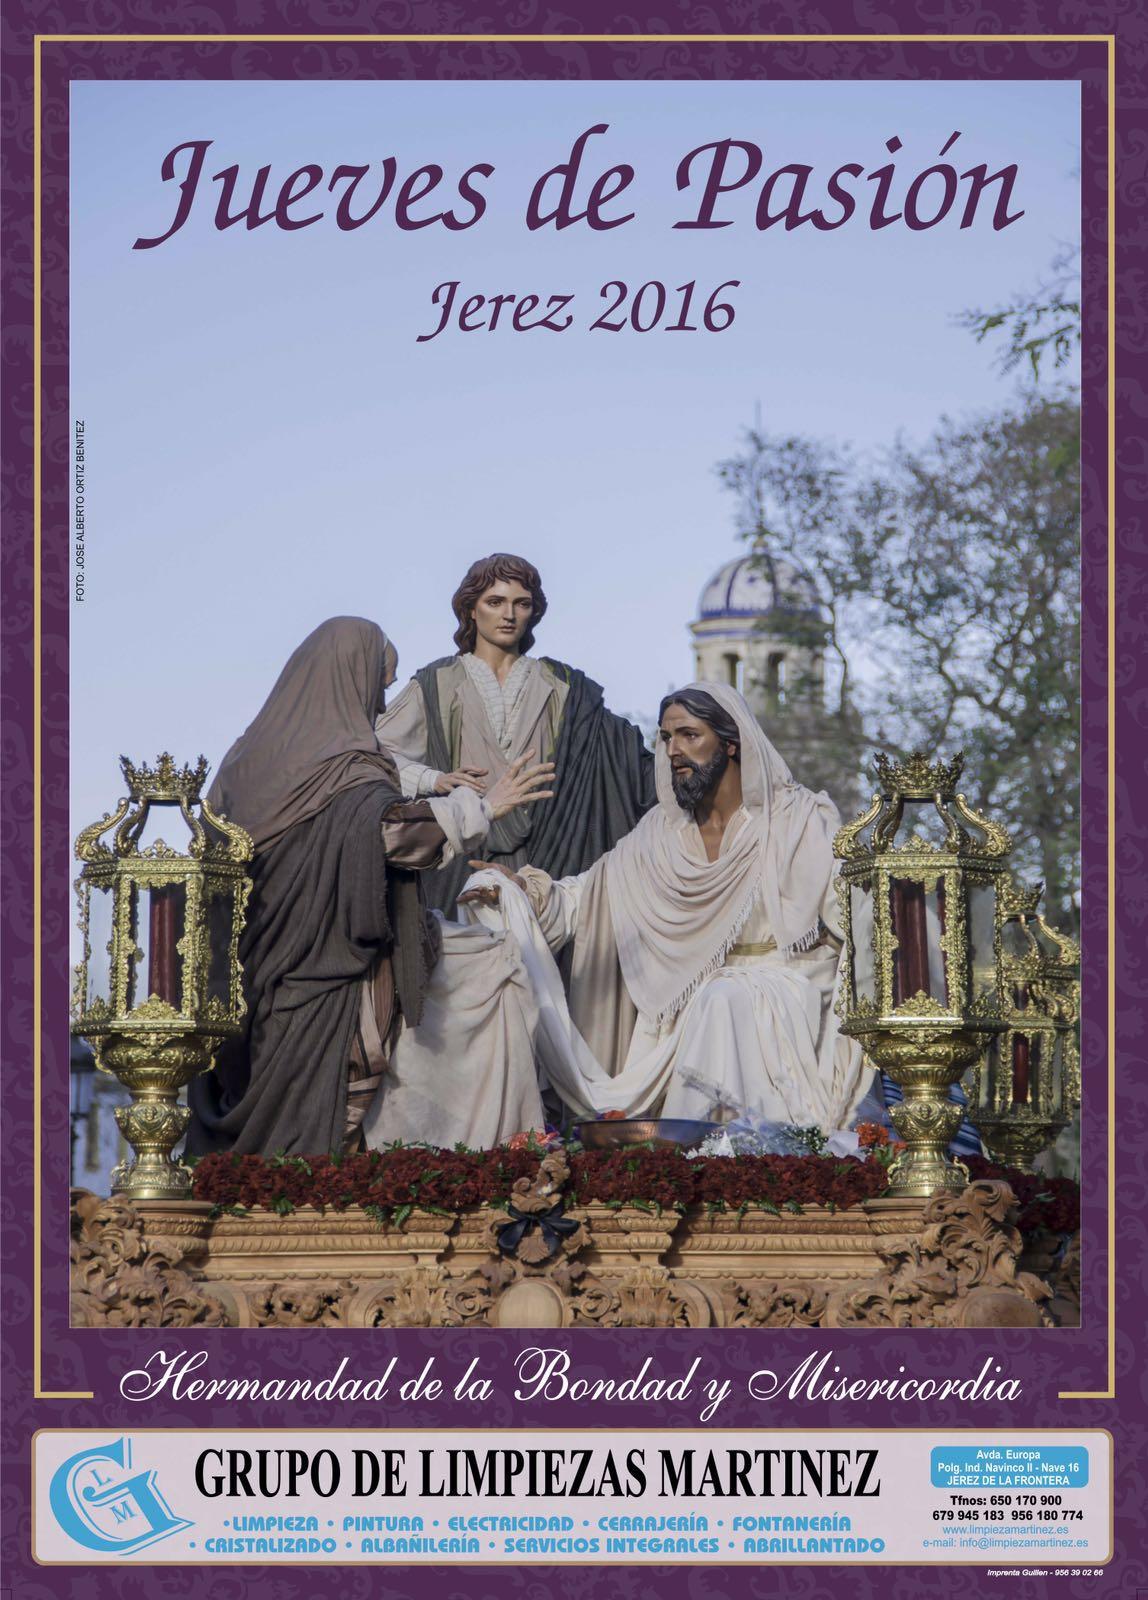 Hdad.del Lavatorio,Jerez 2016.